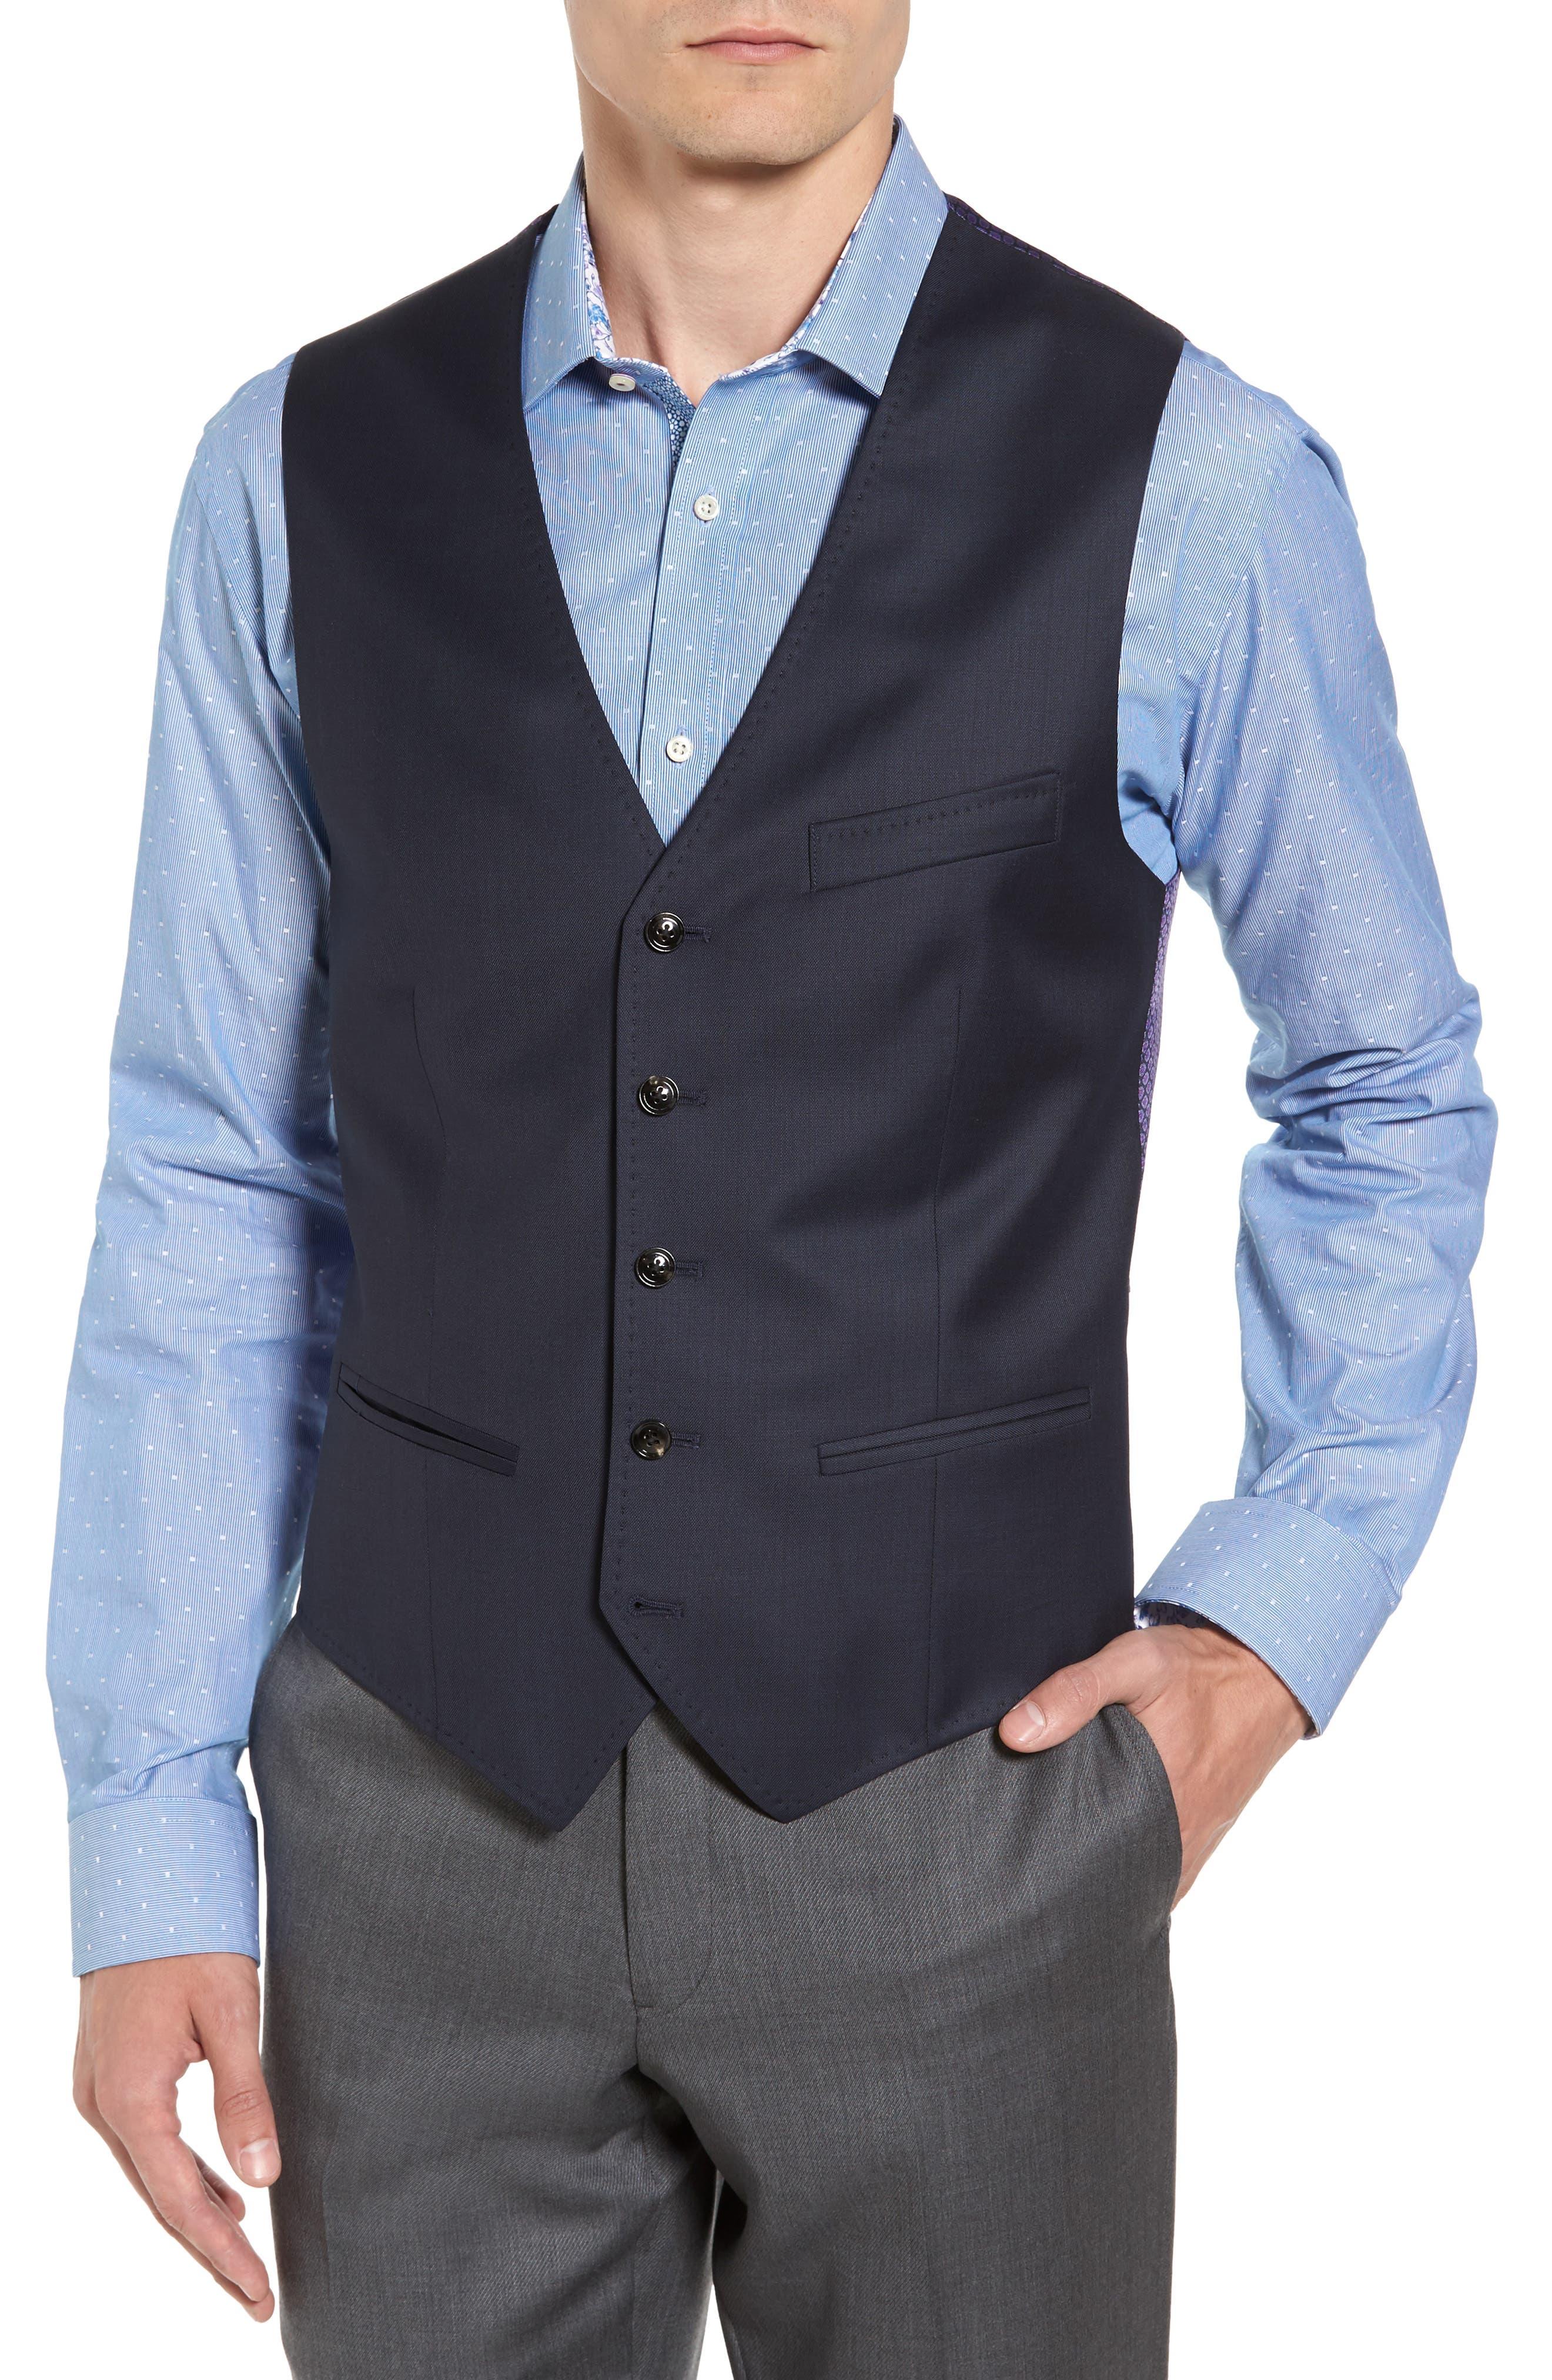 Troy Trim Fit Solid Wool Vest,                         Main,                         color, Old Blue